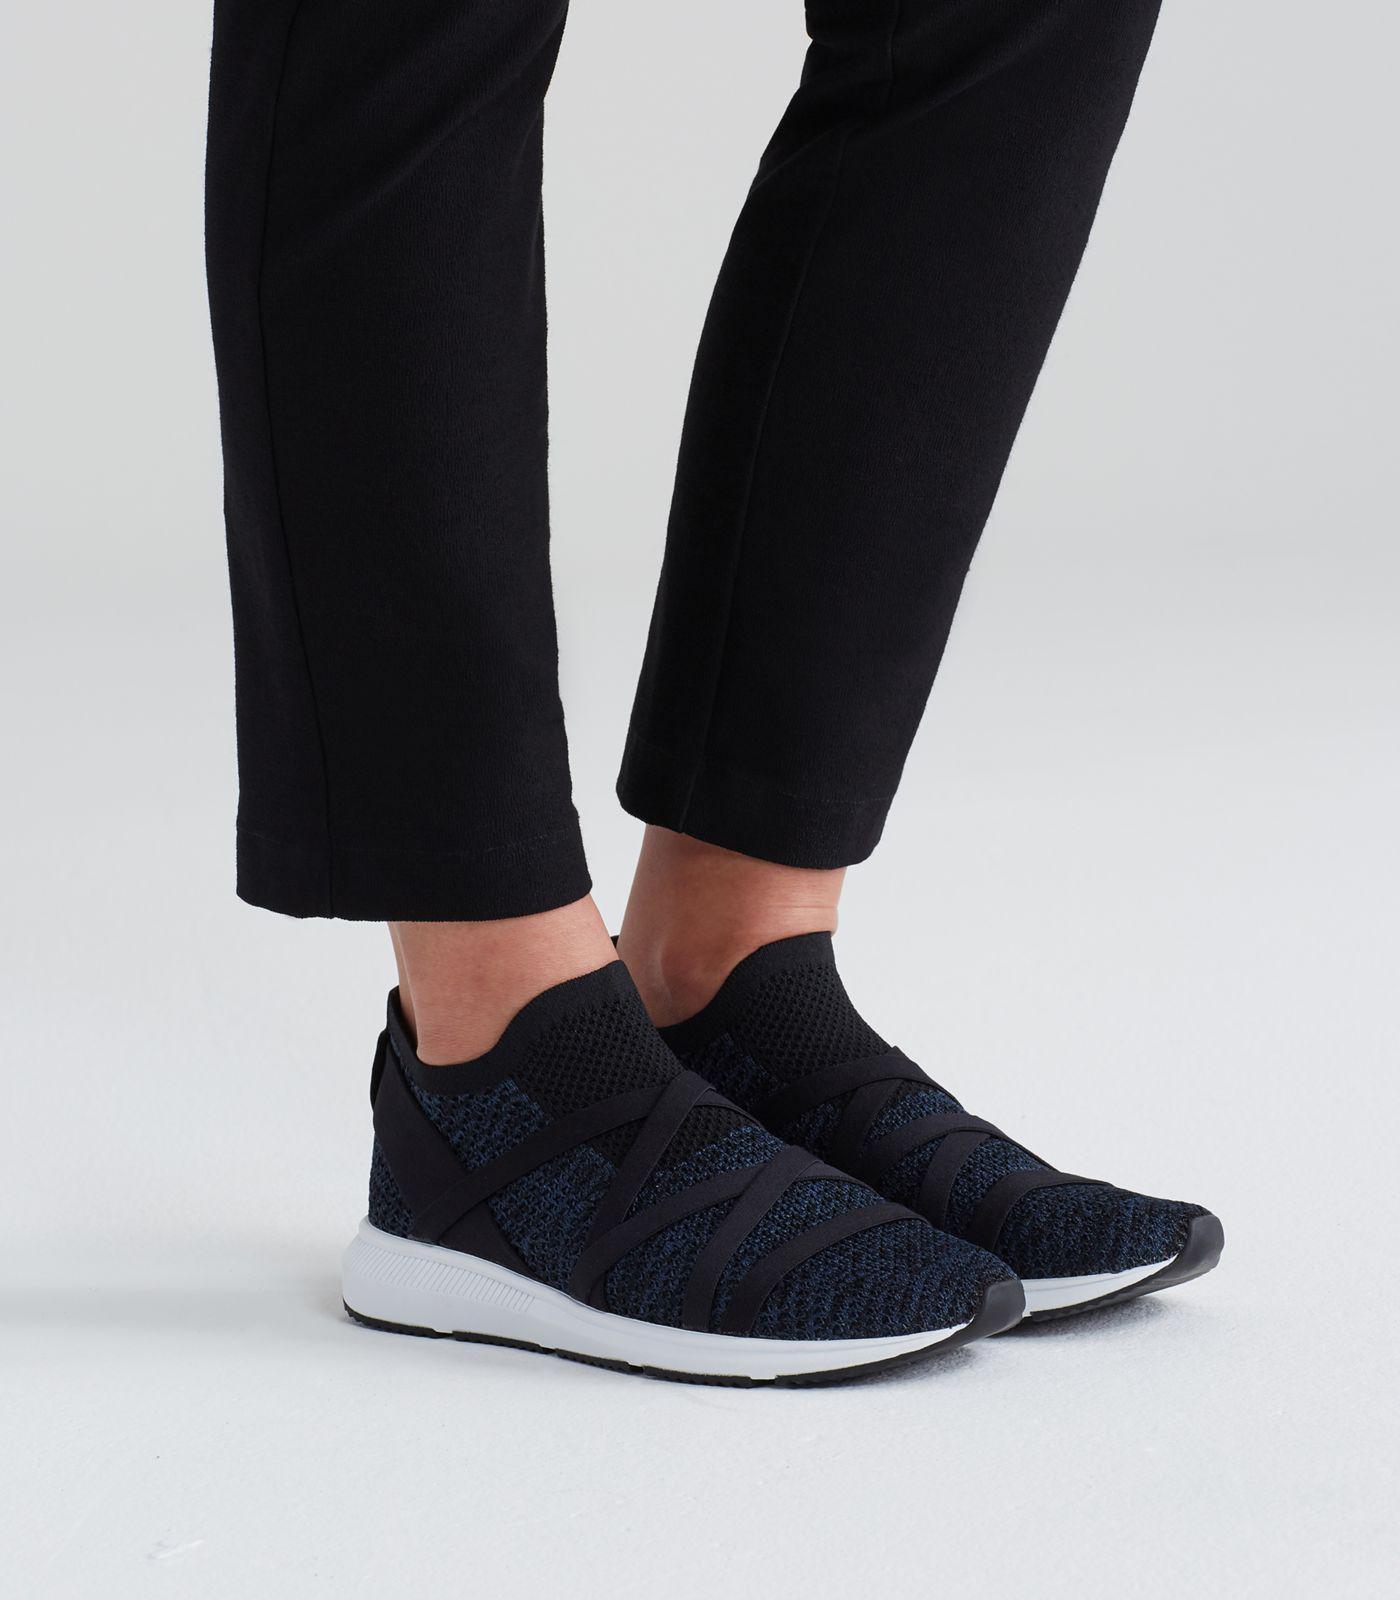 Xanady Sustainable Mesh Sneaker in Blue